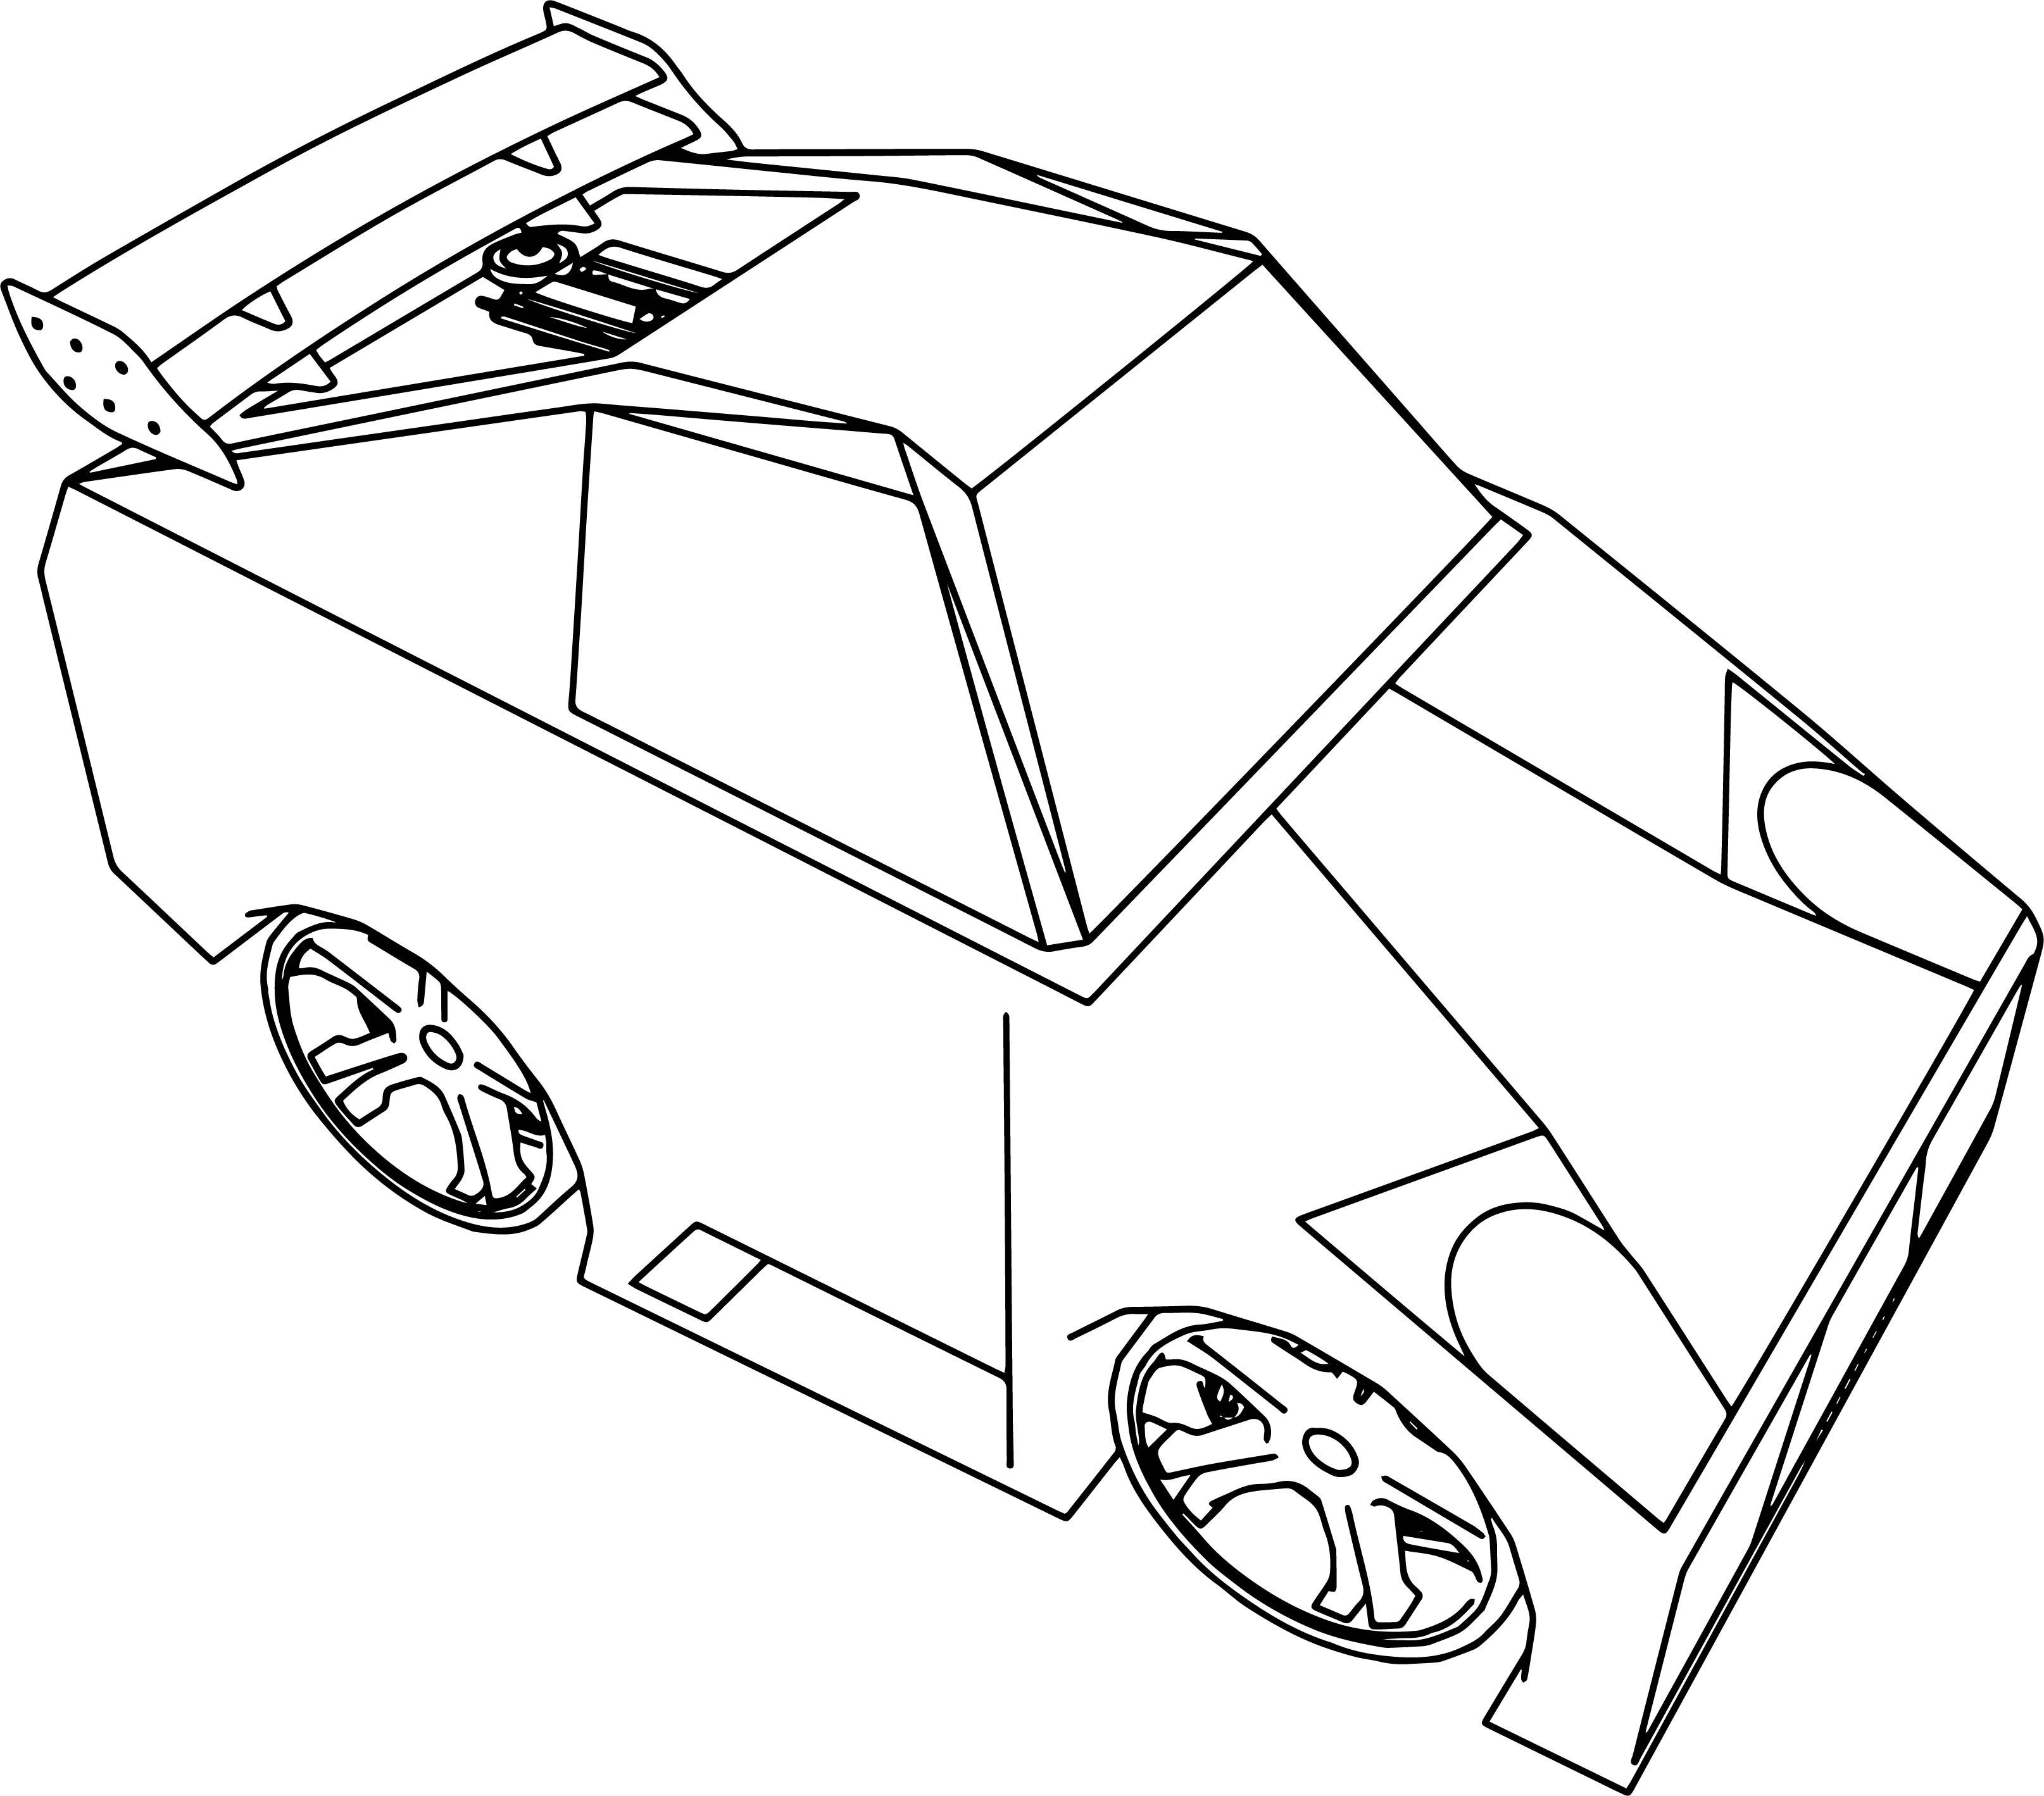 Cartoon Lambo Tune Cars Coloring Page